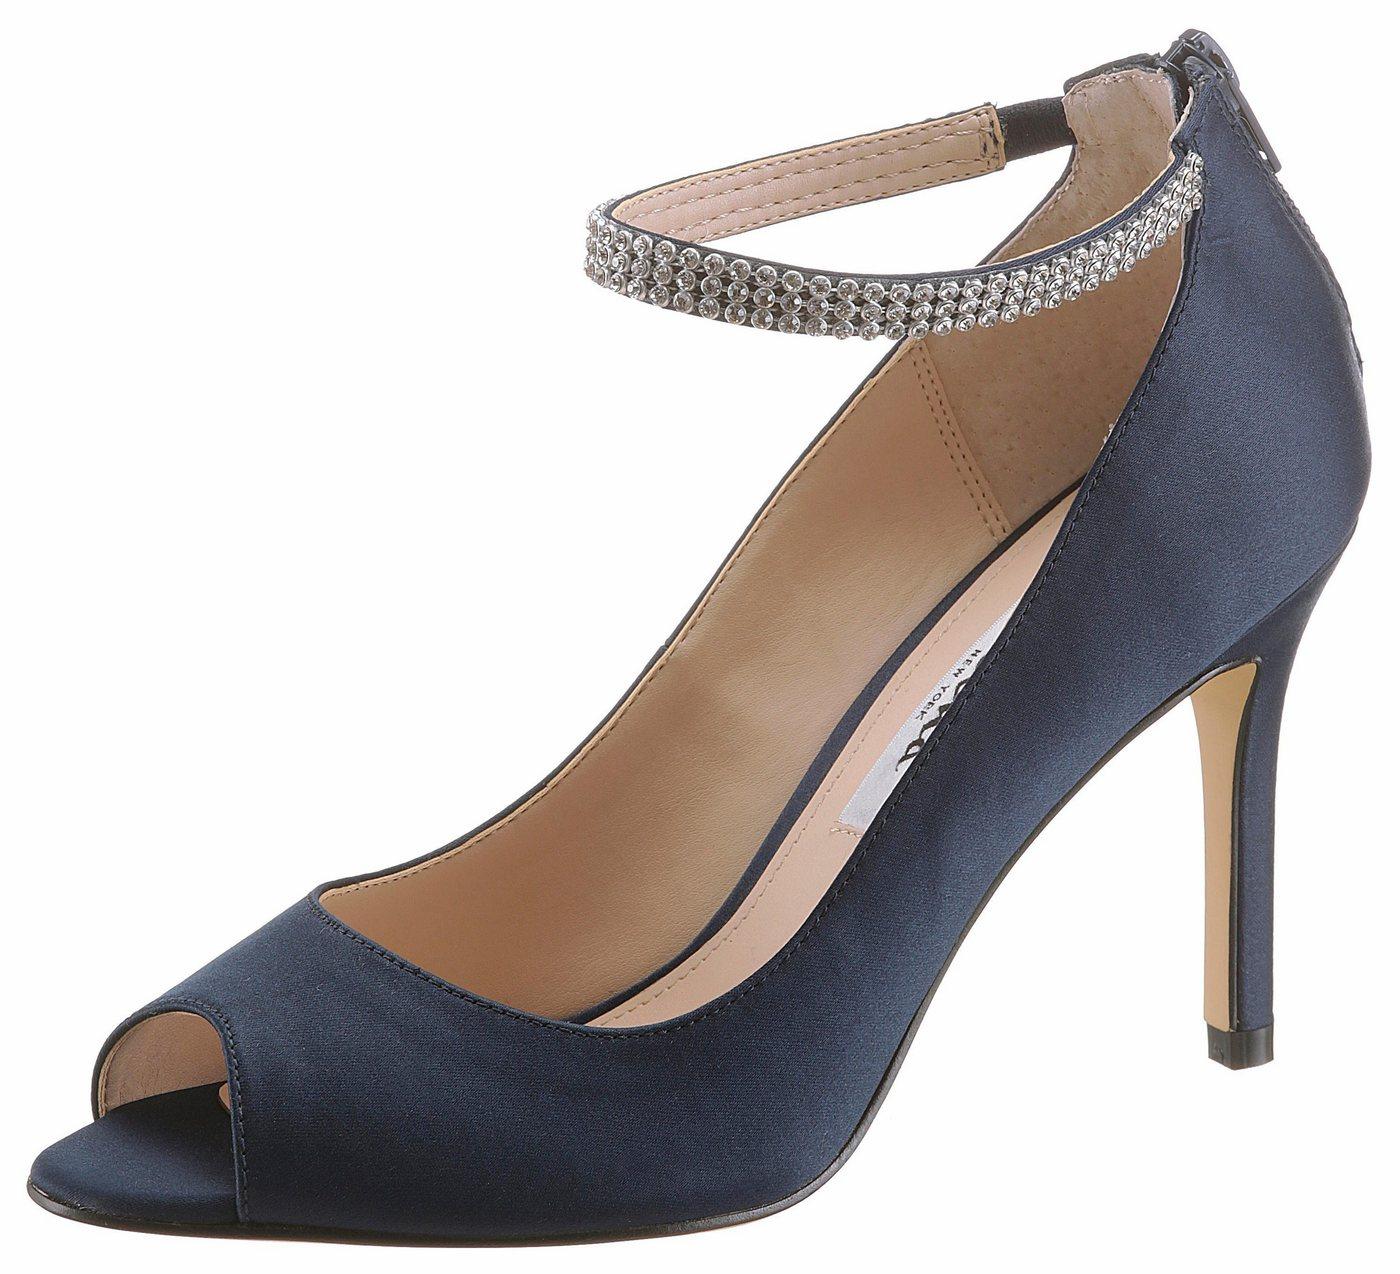 Damen Nina  Peeptoepumps mit funkelnden Riemchen blau | 00716142984695